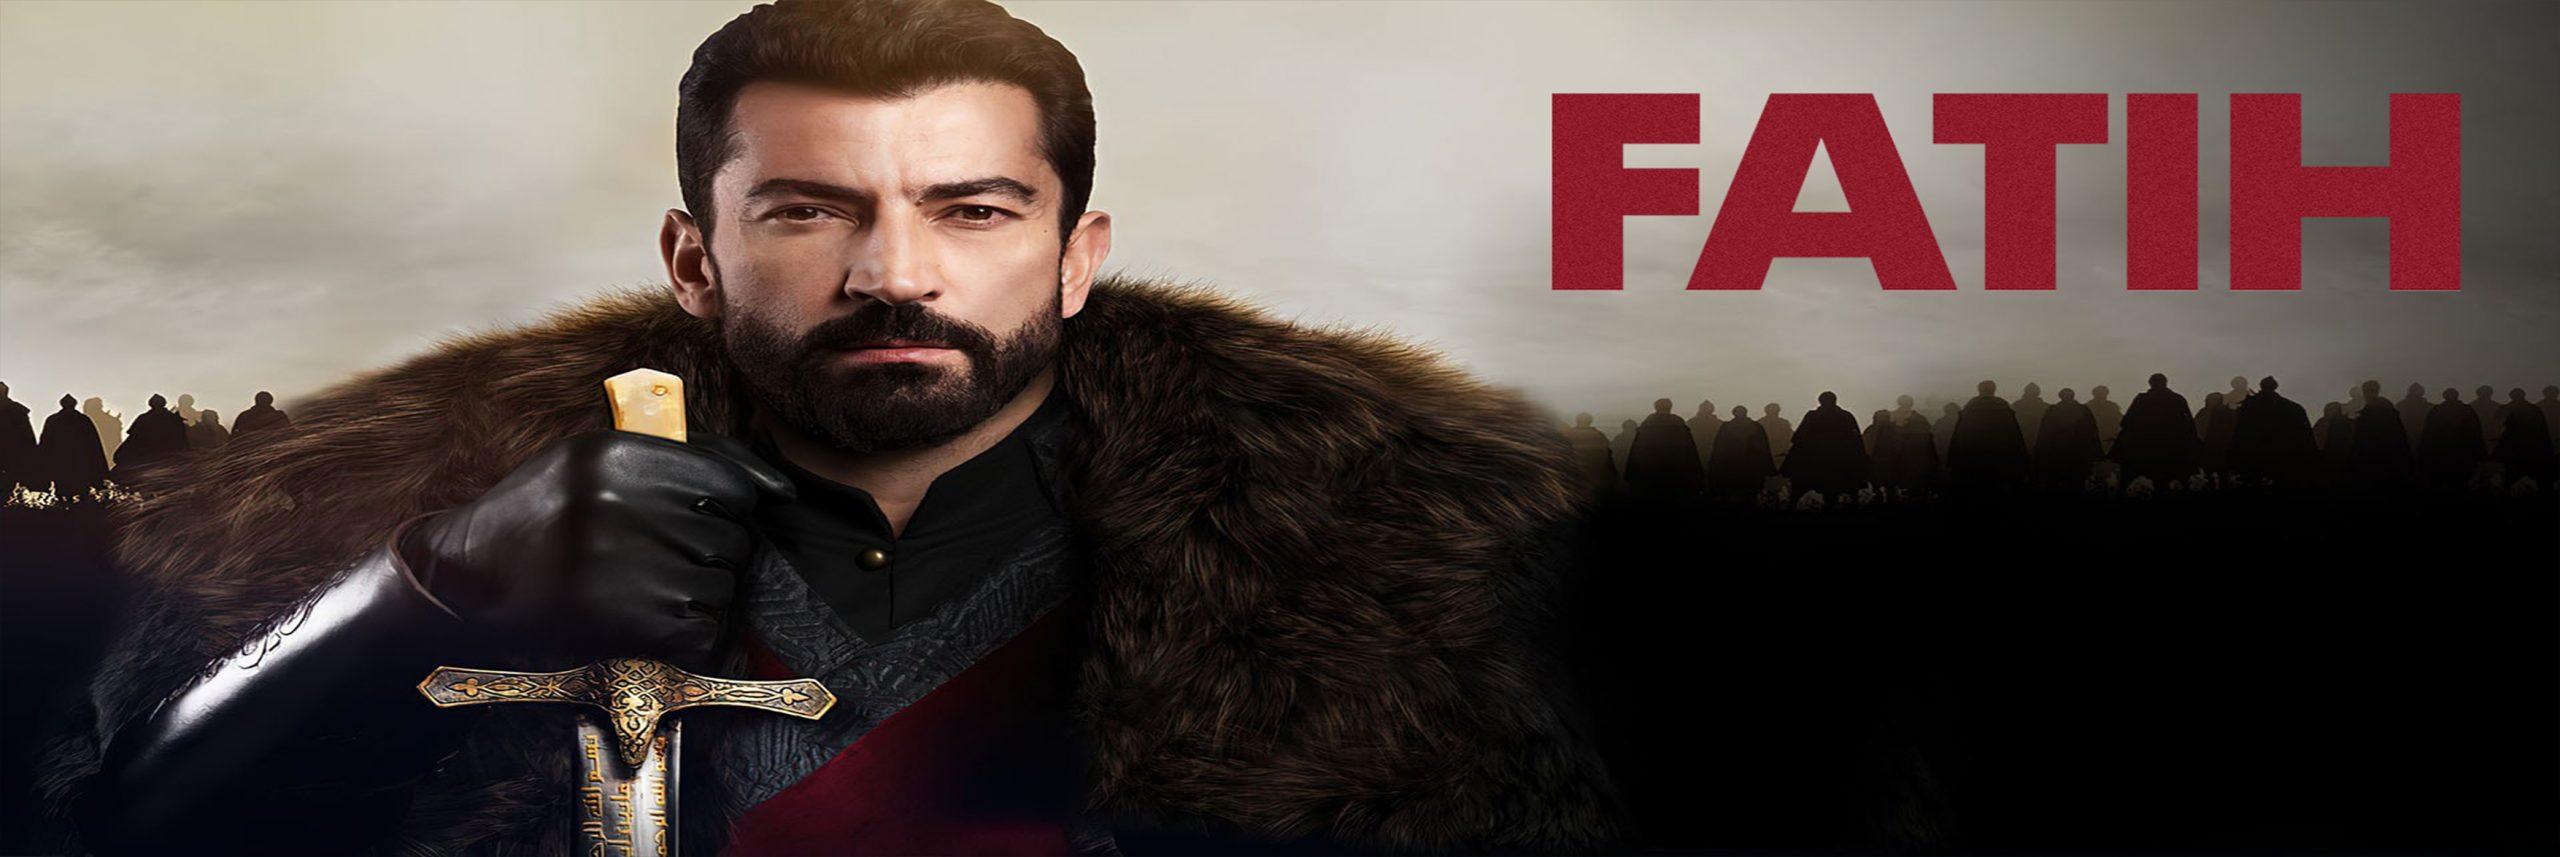 فاتح – Fatih